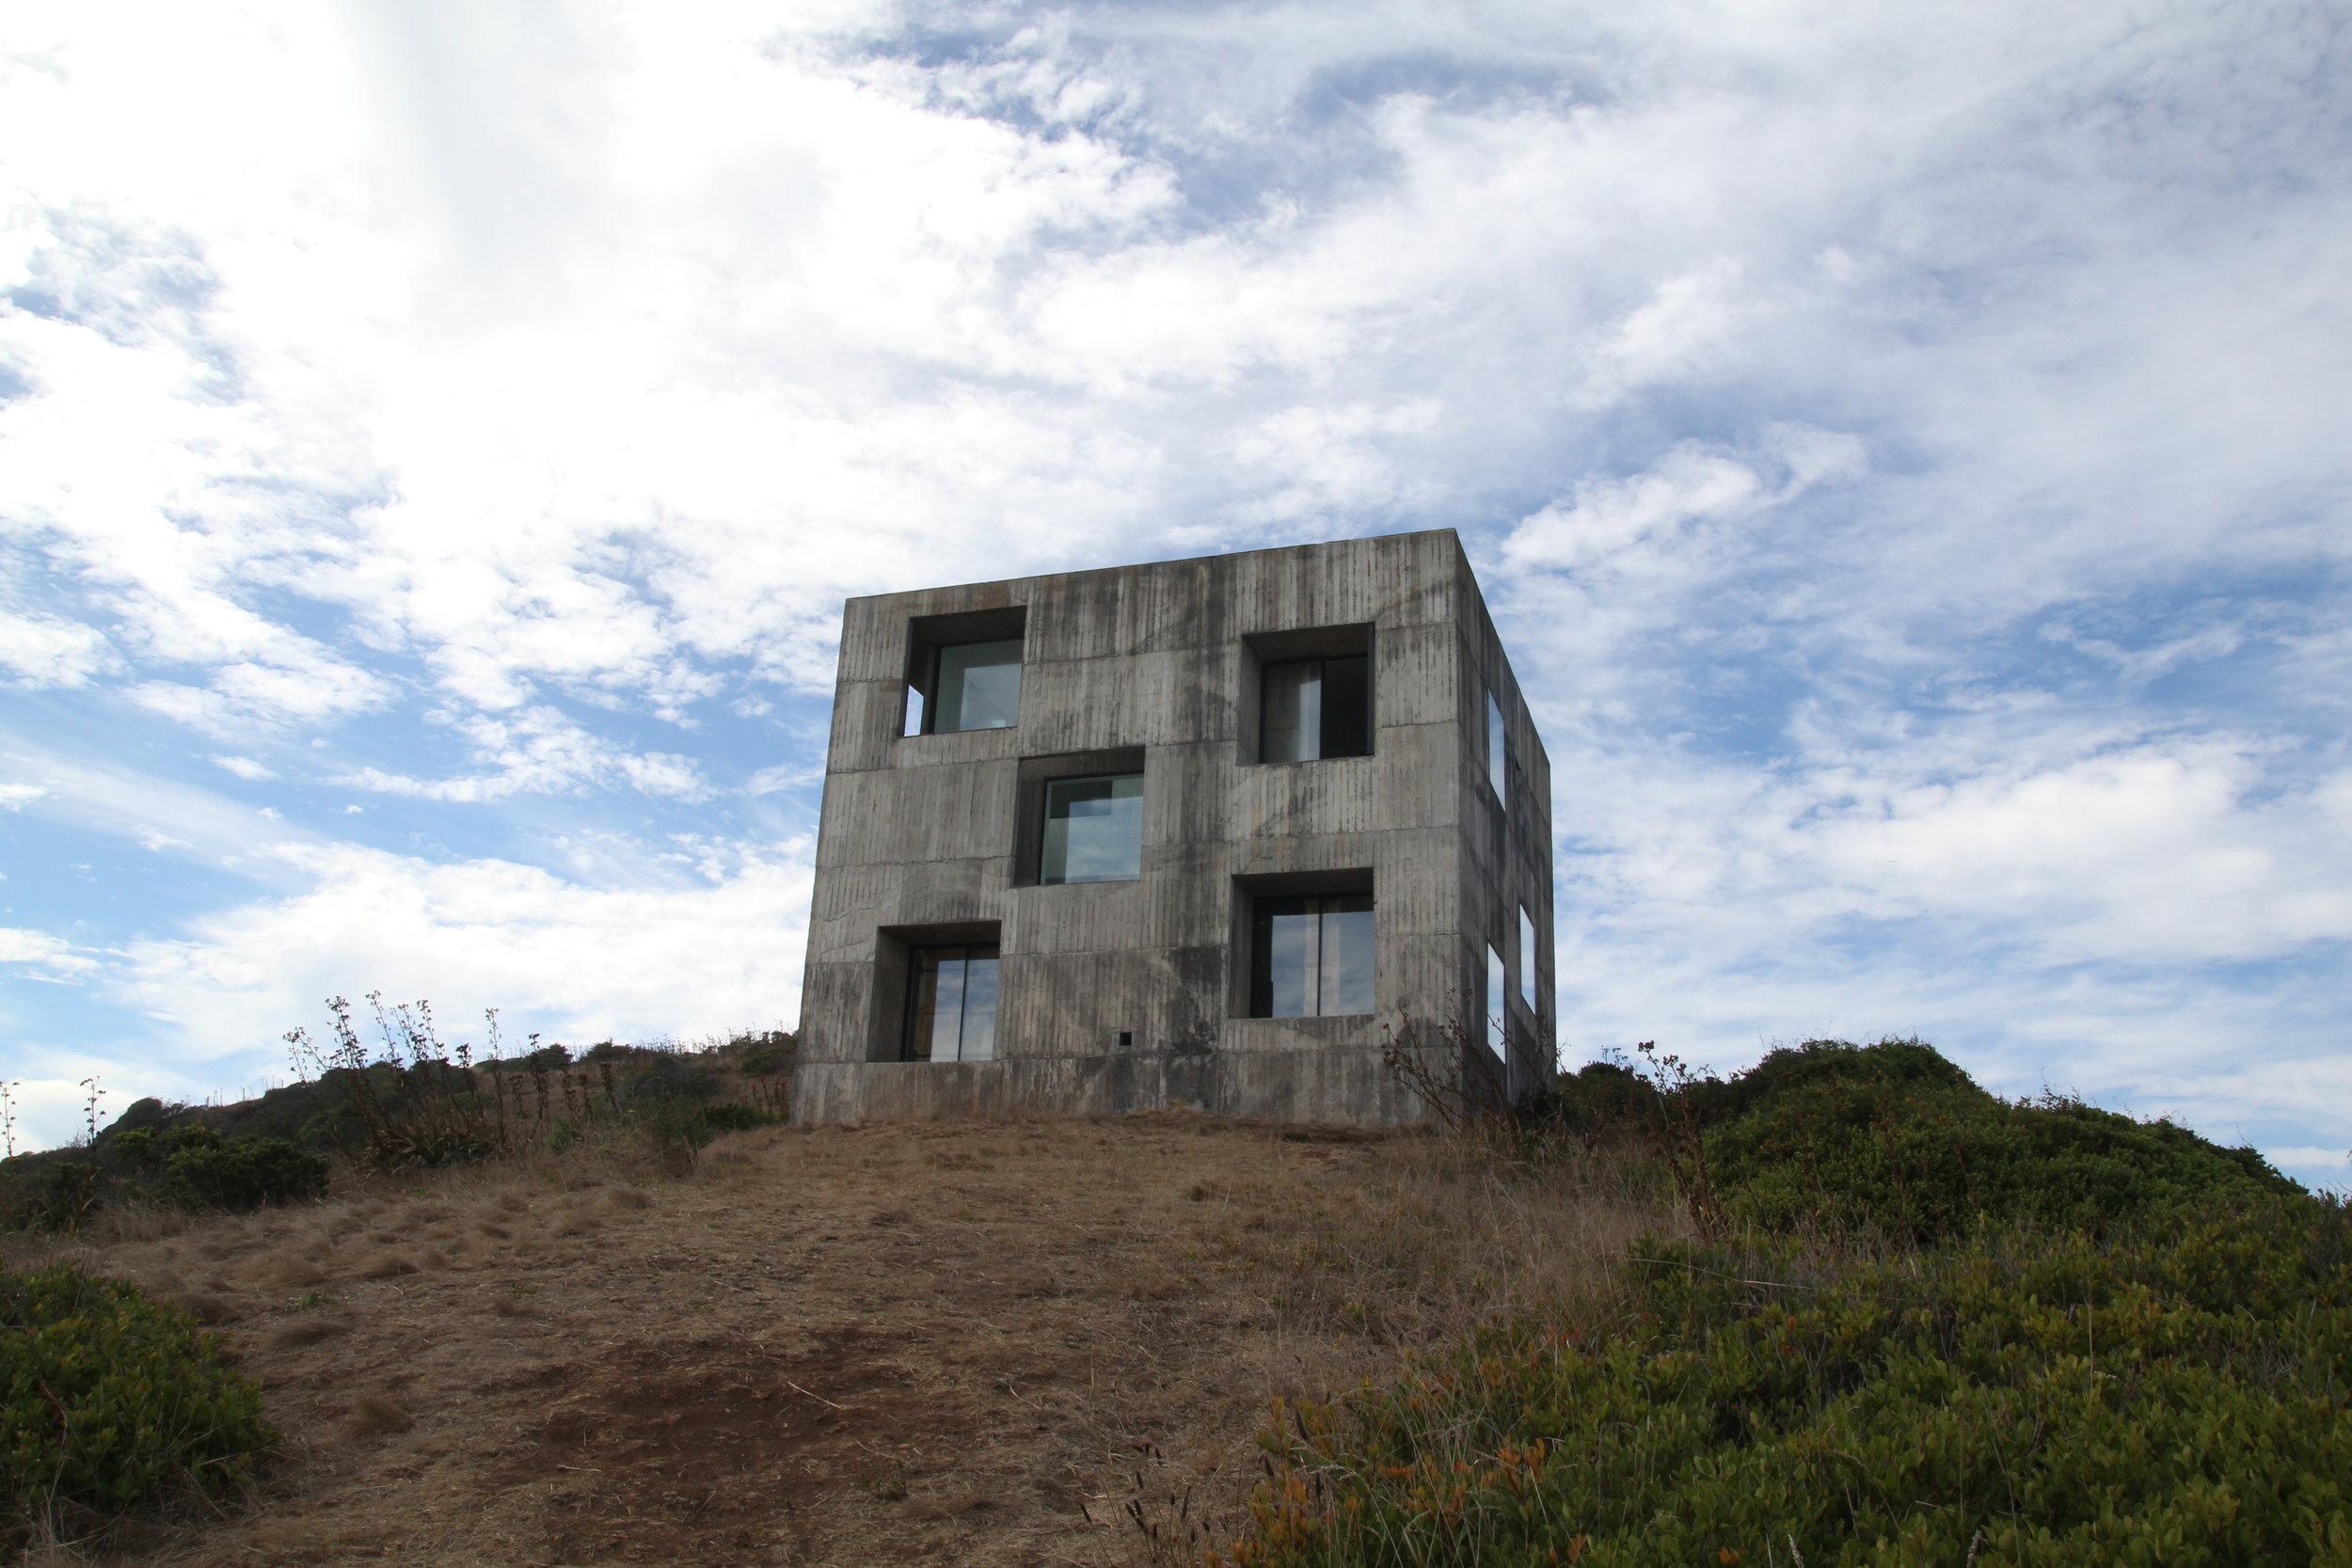 Photos credits. Photo 1 : Oscar Concha. Photo 2 - 7 Triangular Project 2015. Casa Poli.